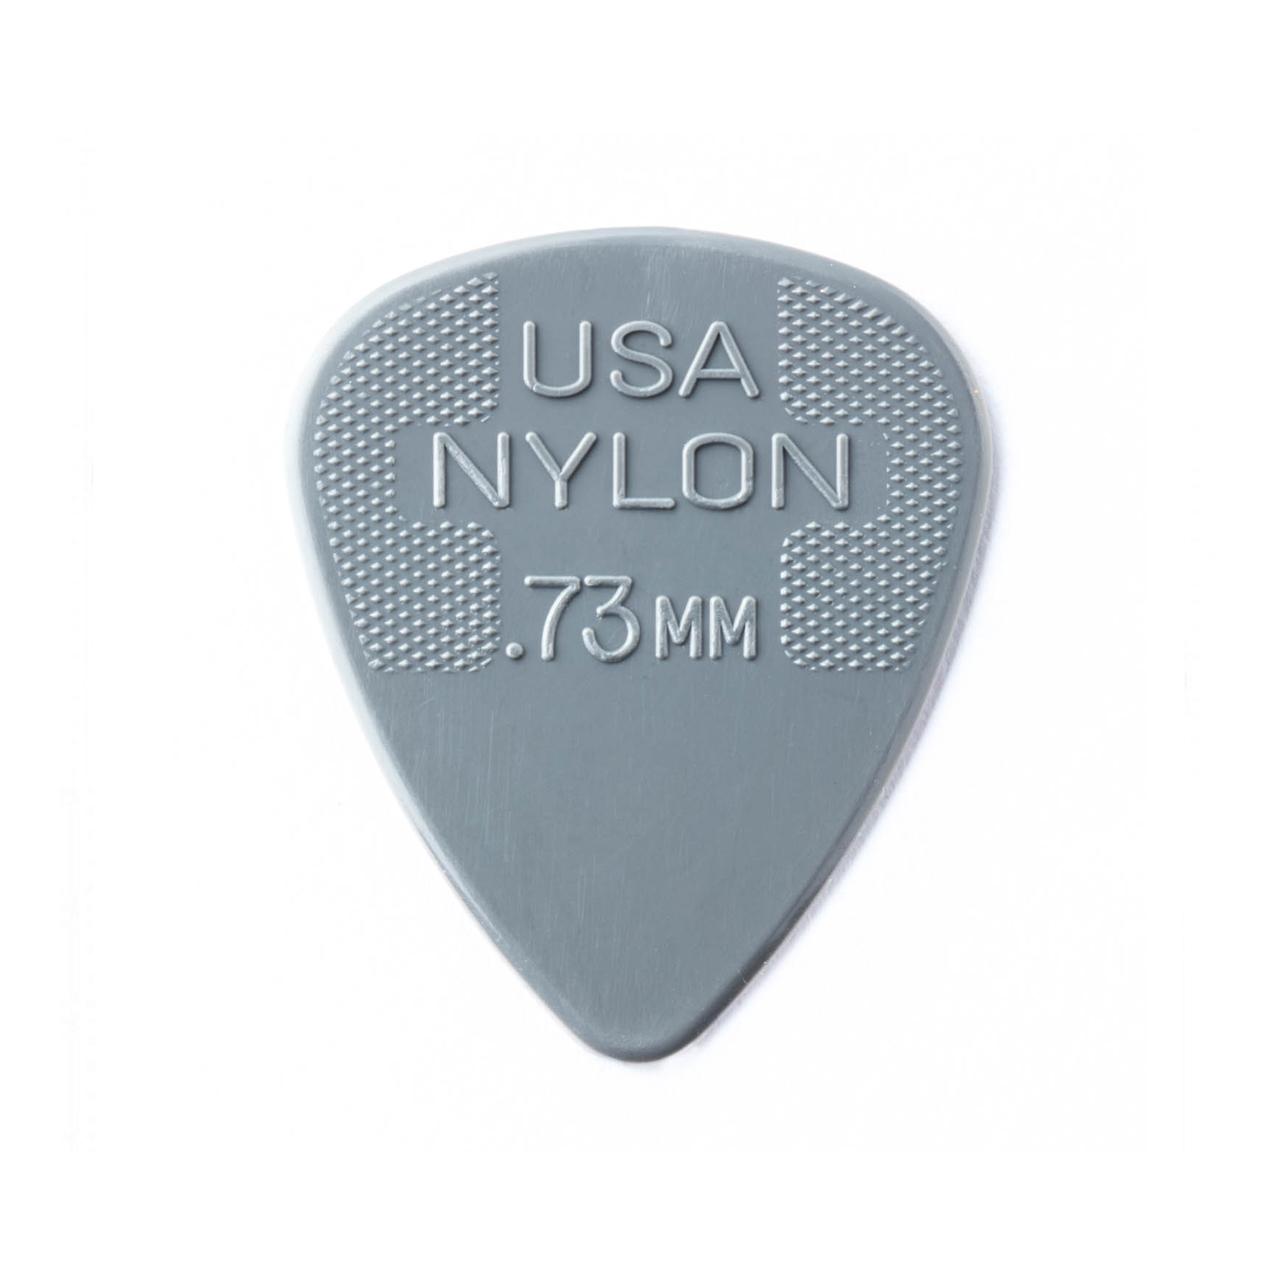 Palheta Nylon Standard 0,73mm Cinza Pct C/72 44r.73 Dunlop  - Audio Video & cia